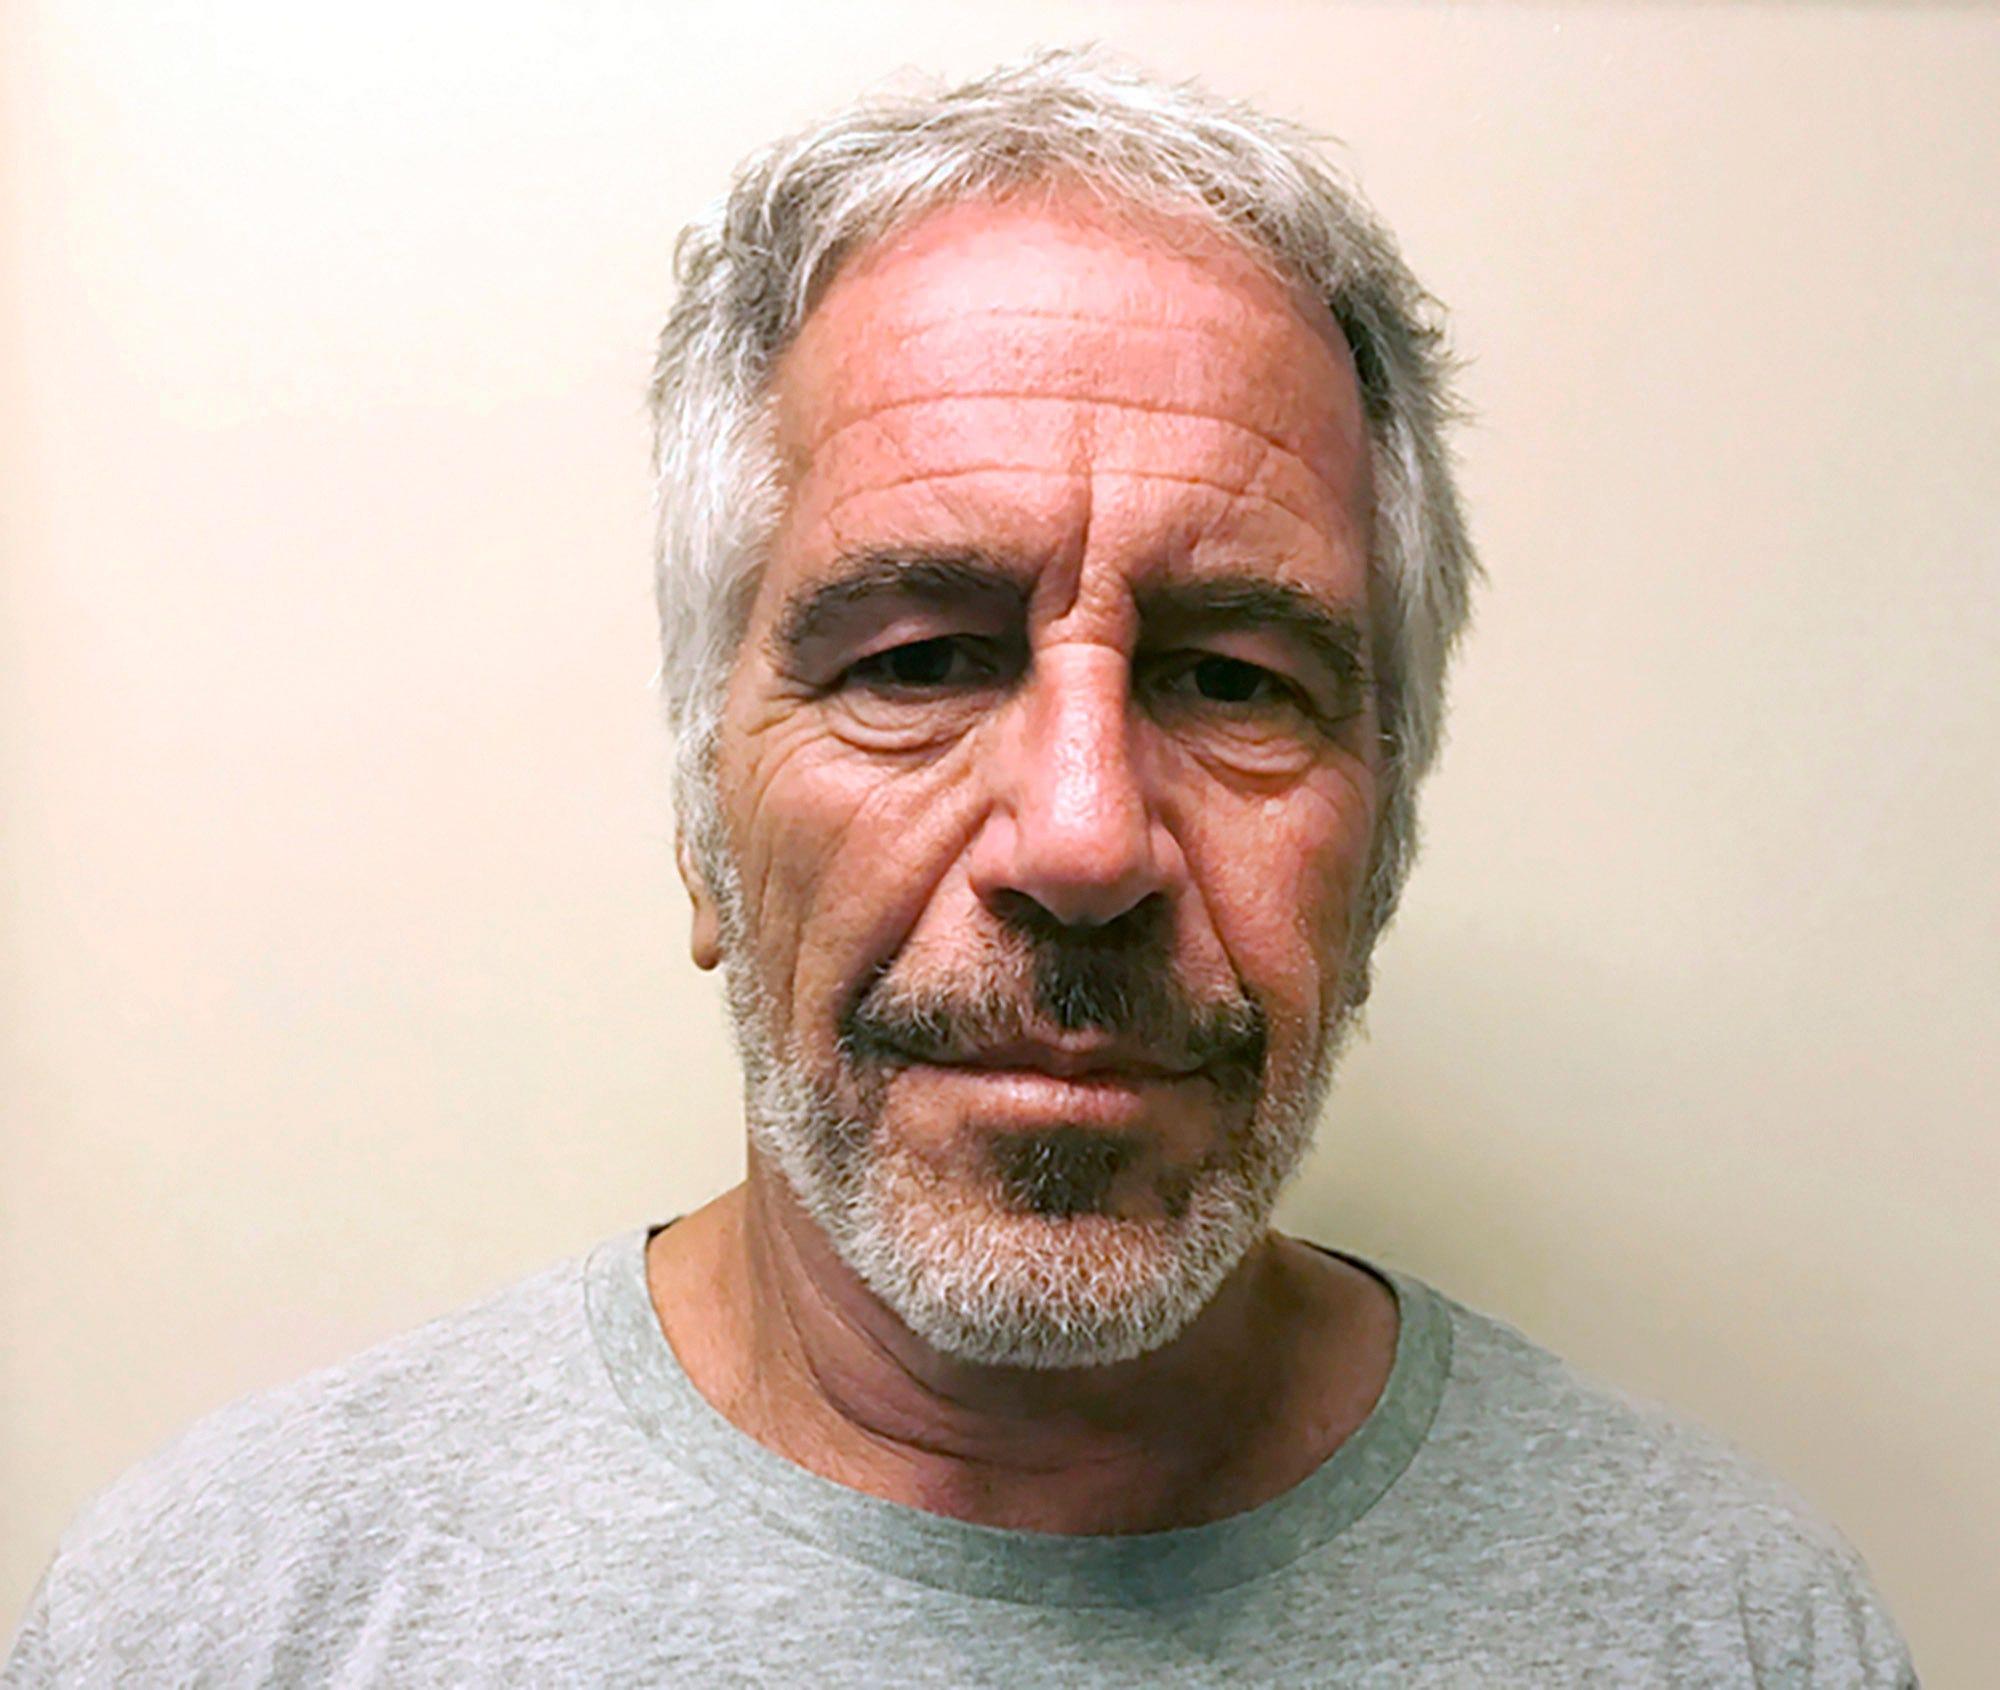 Merrick Garland: Handling of Jeffrey Epstein case was  horrendous